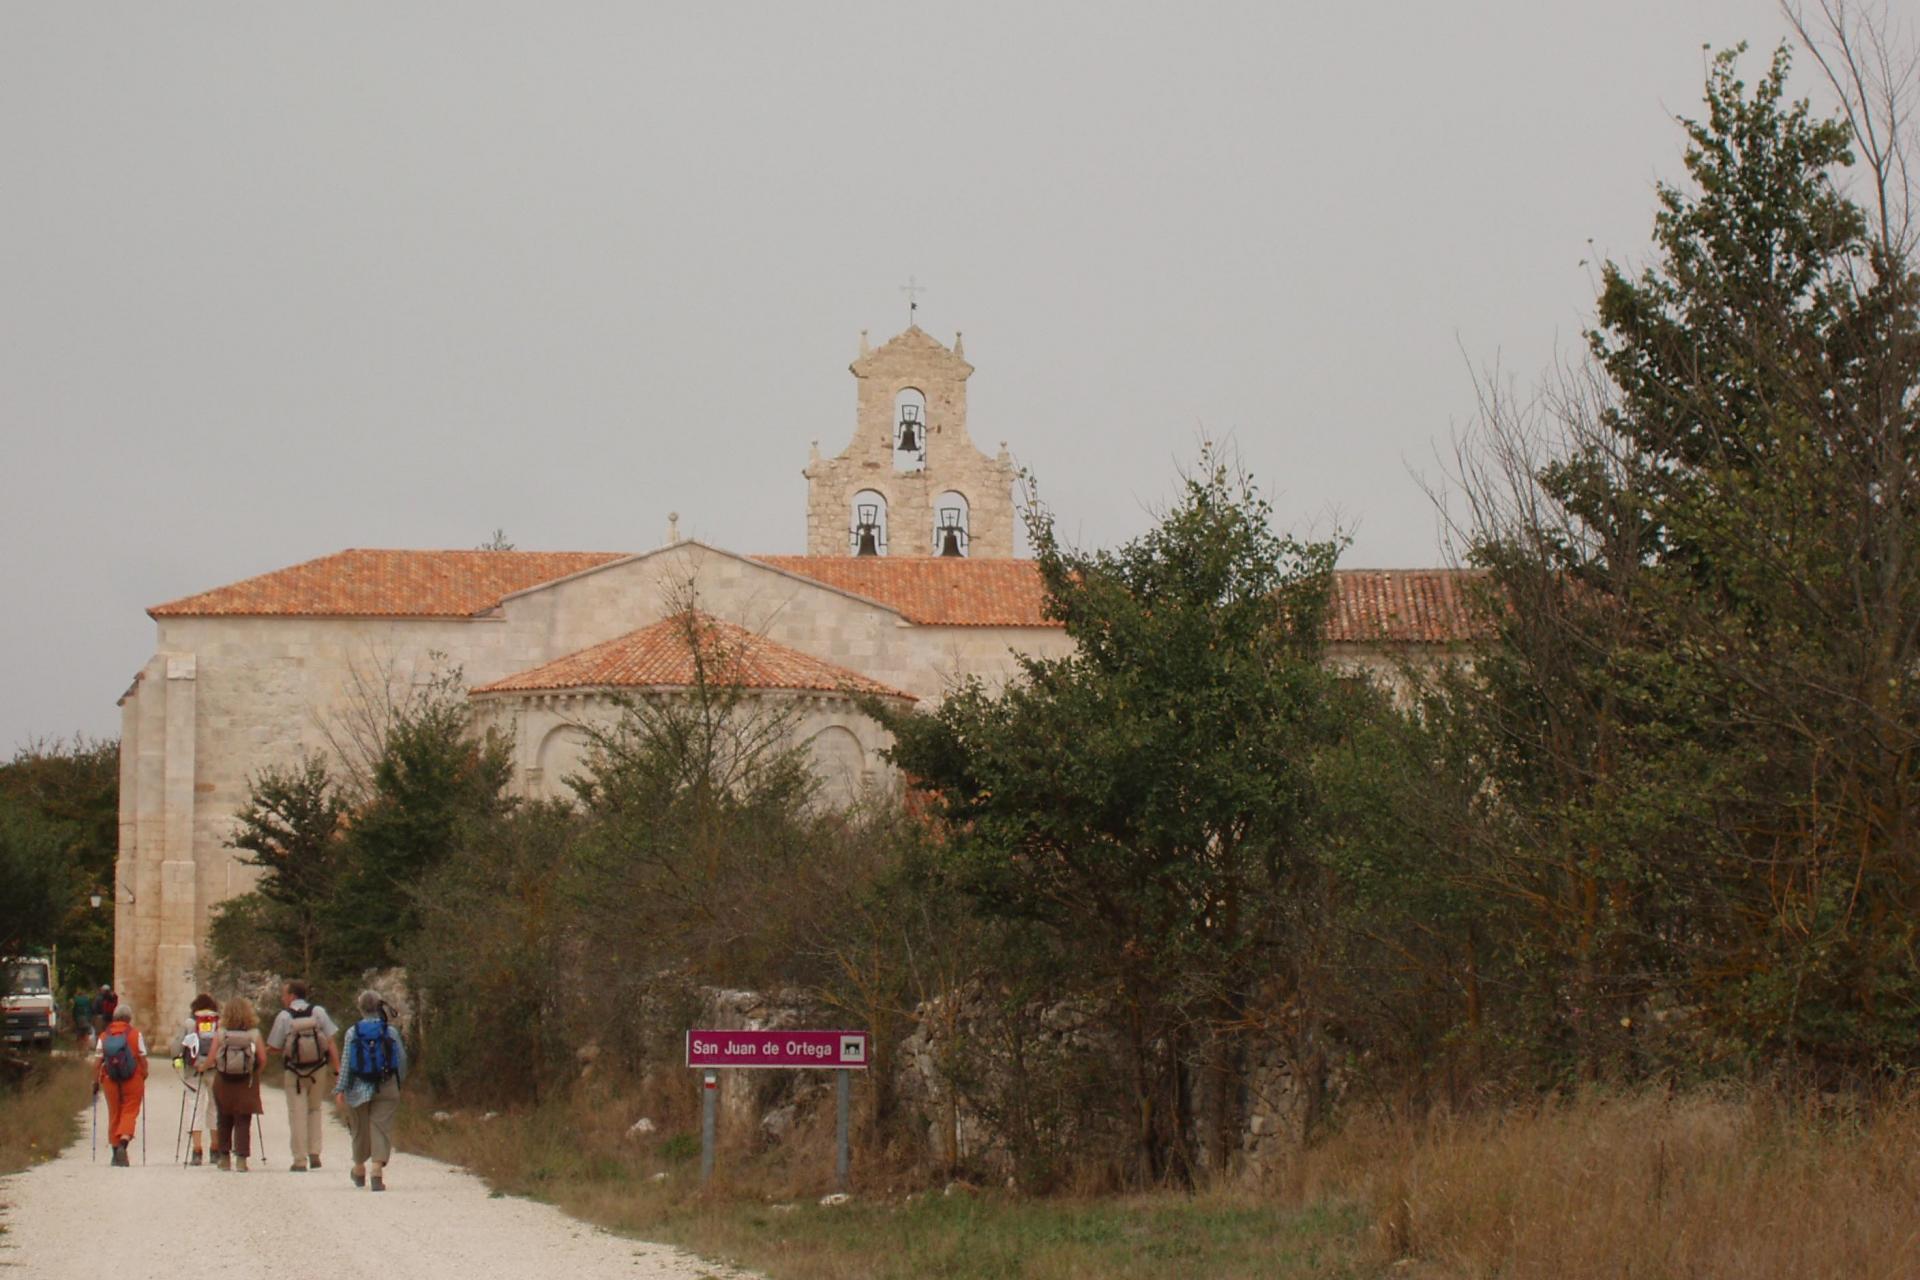 Hiking tour on the Camino de Santiago, Pilgrim Route, Spain